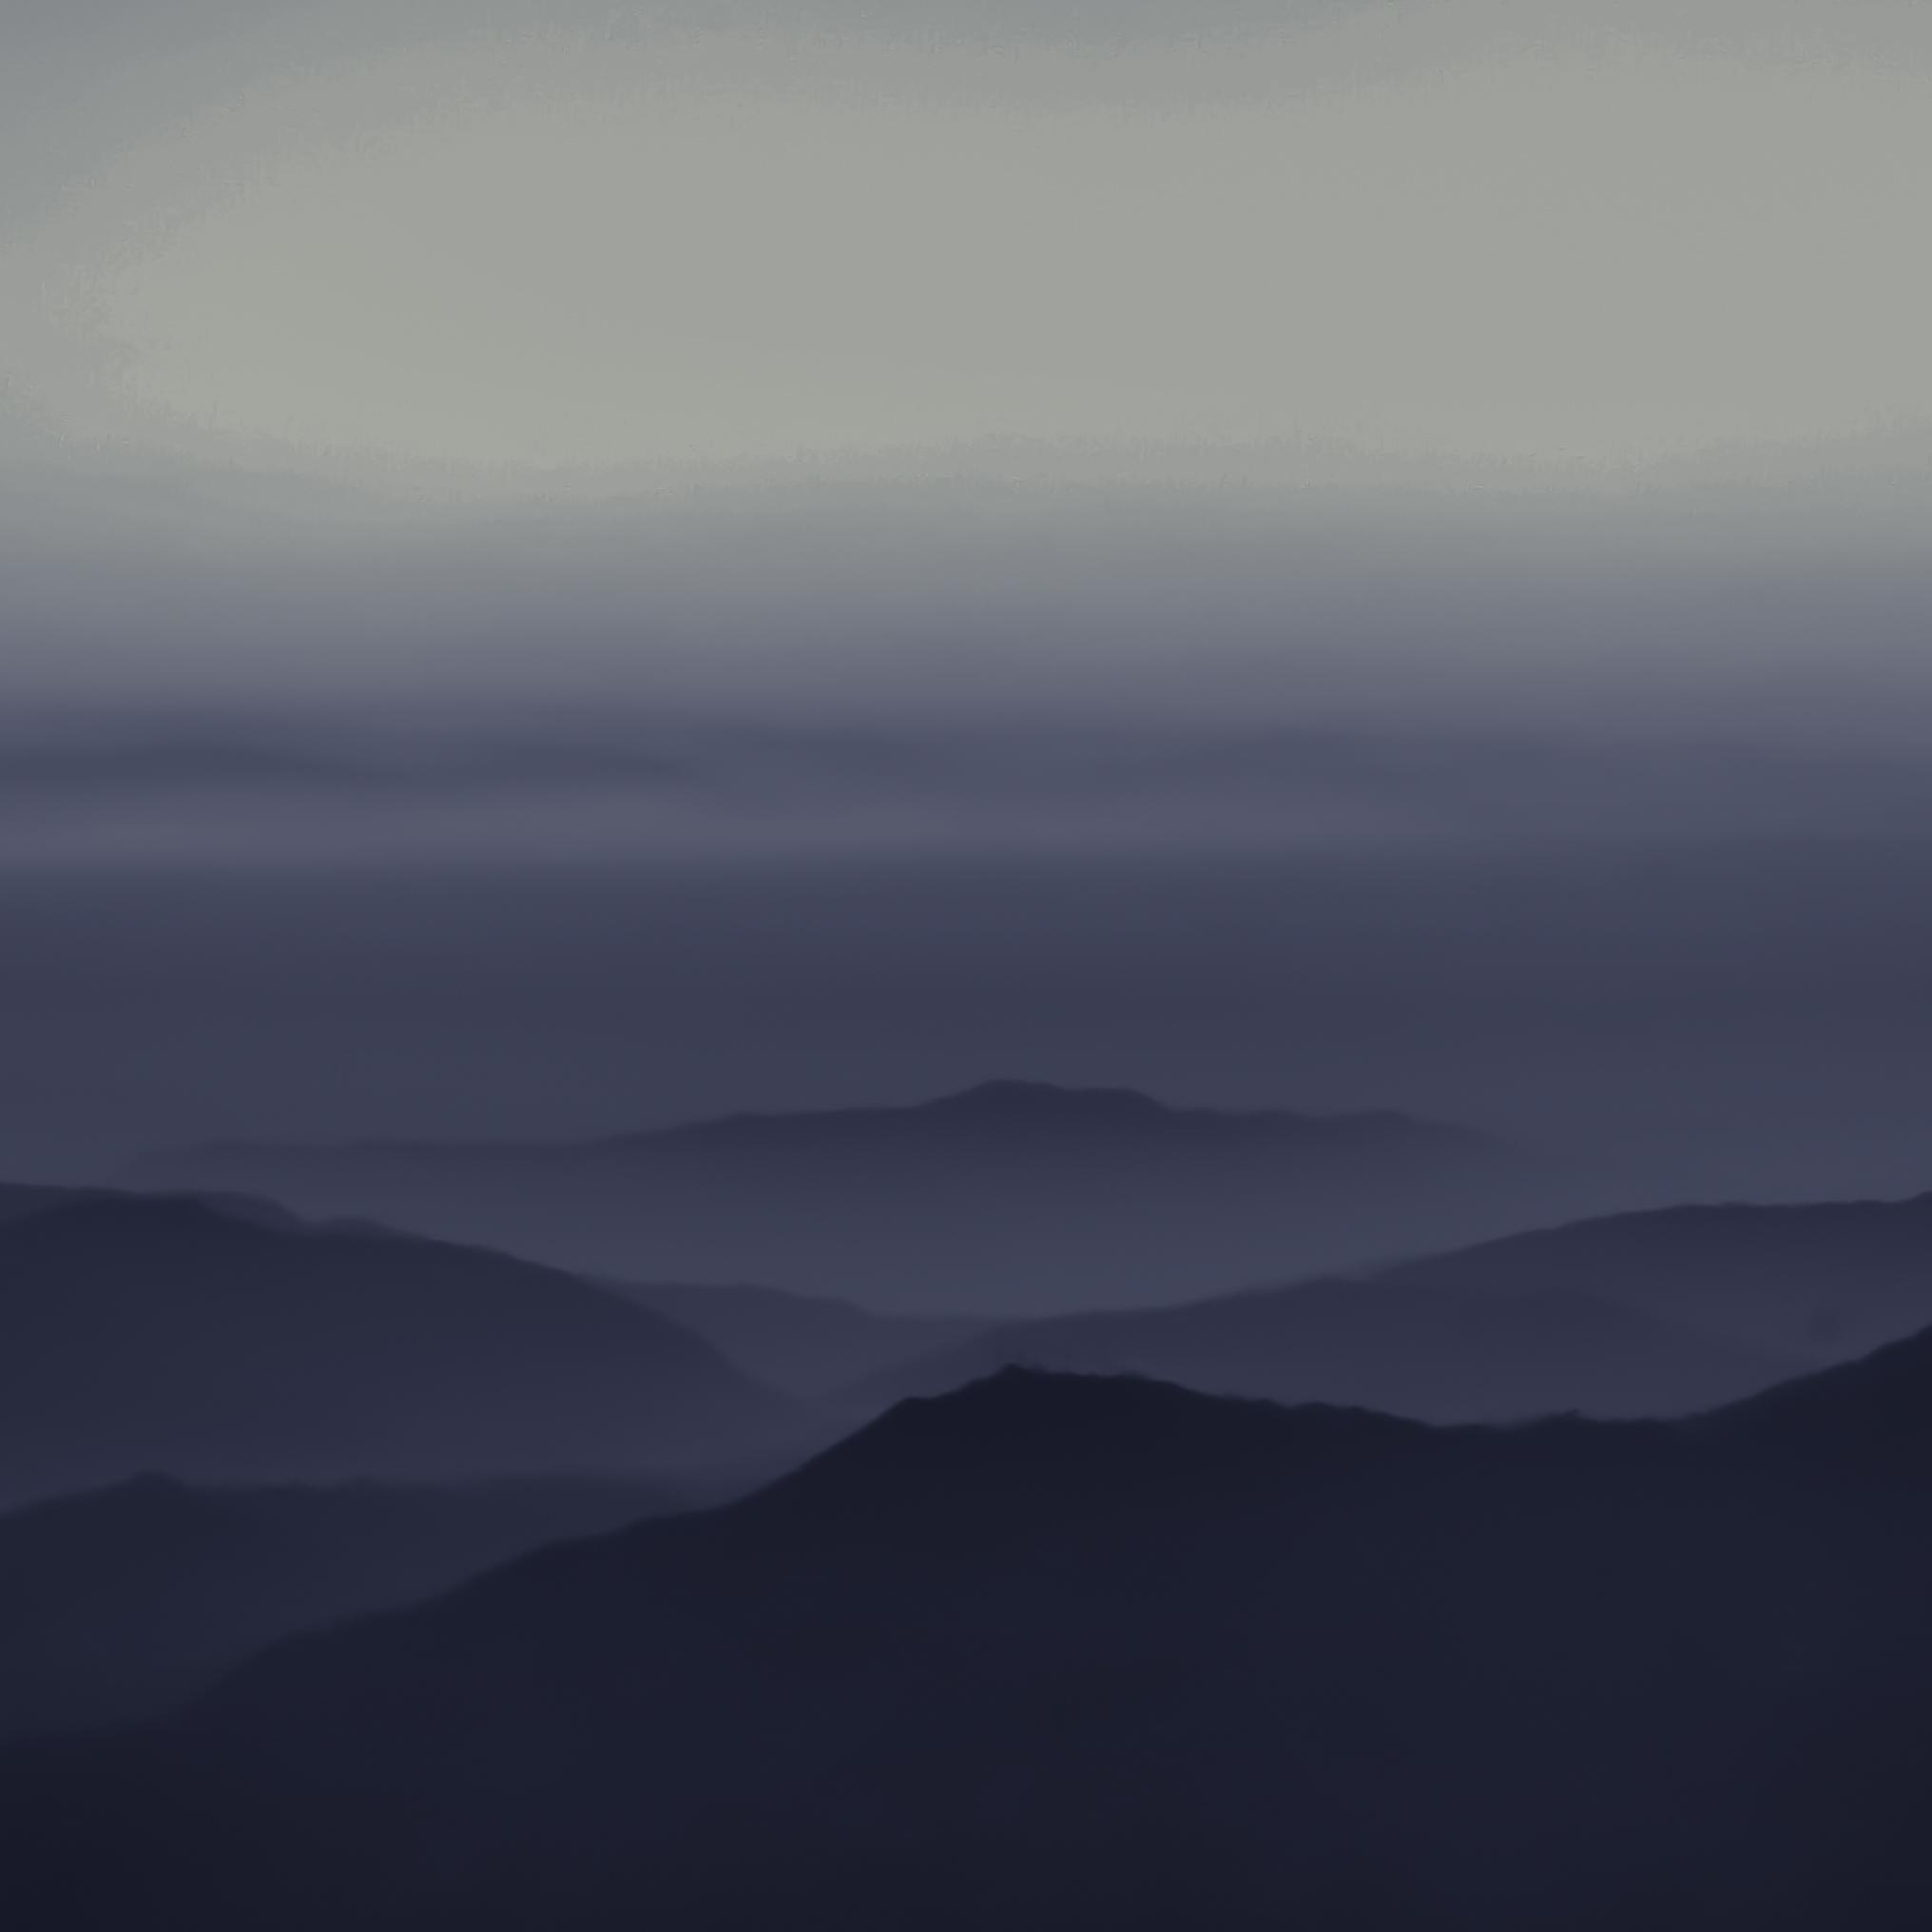 78360095a15173 File Dark Mist.jpg - Wikimedia Commons